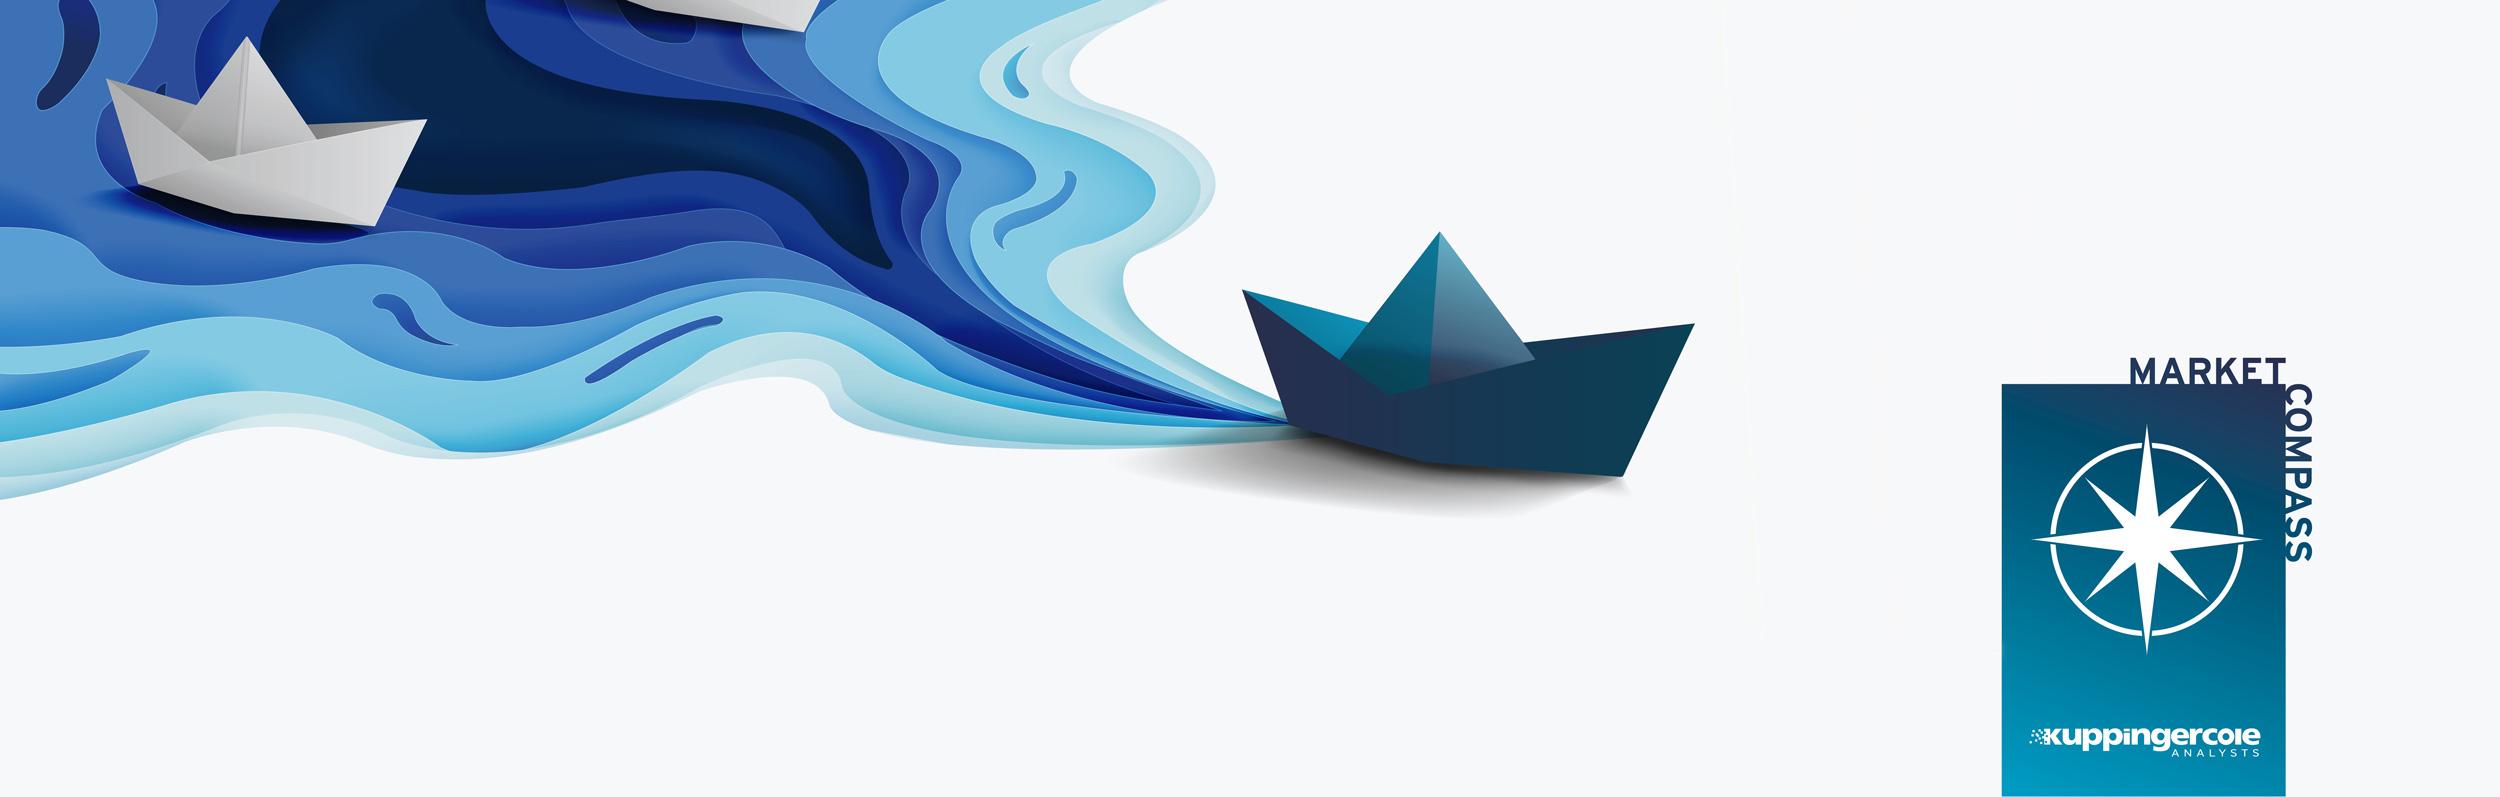 Digital Workplace Delivery Platforms